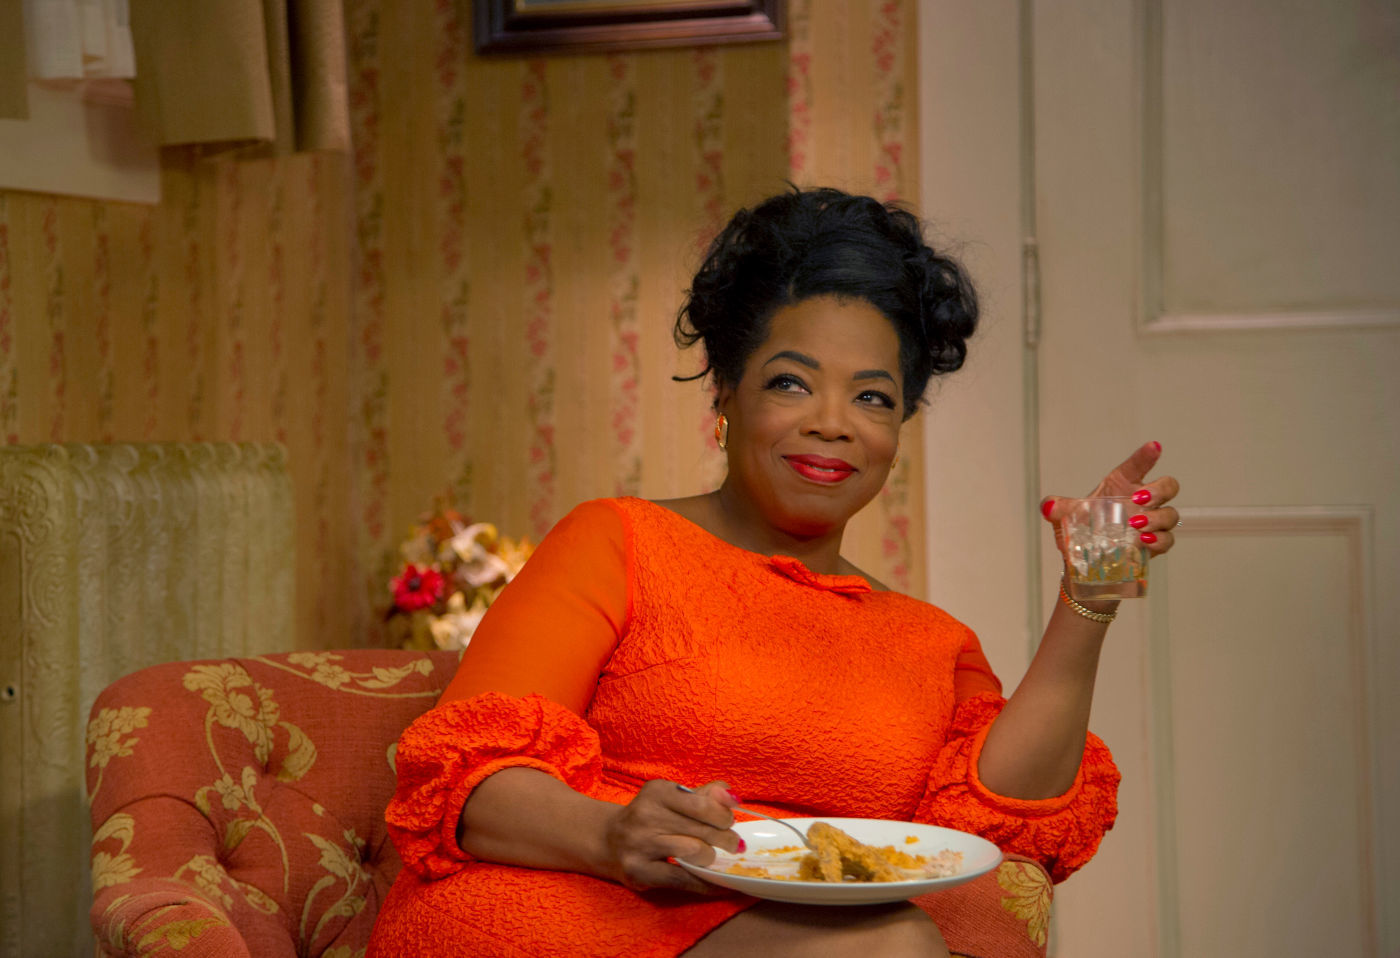 Lee-Daniels-The-Butler-Oprah-Winfrey.jpg